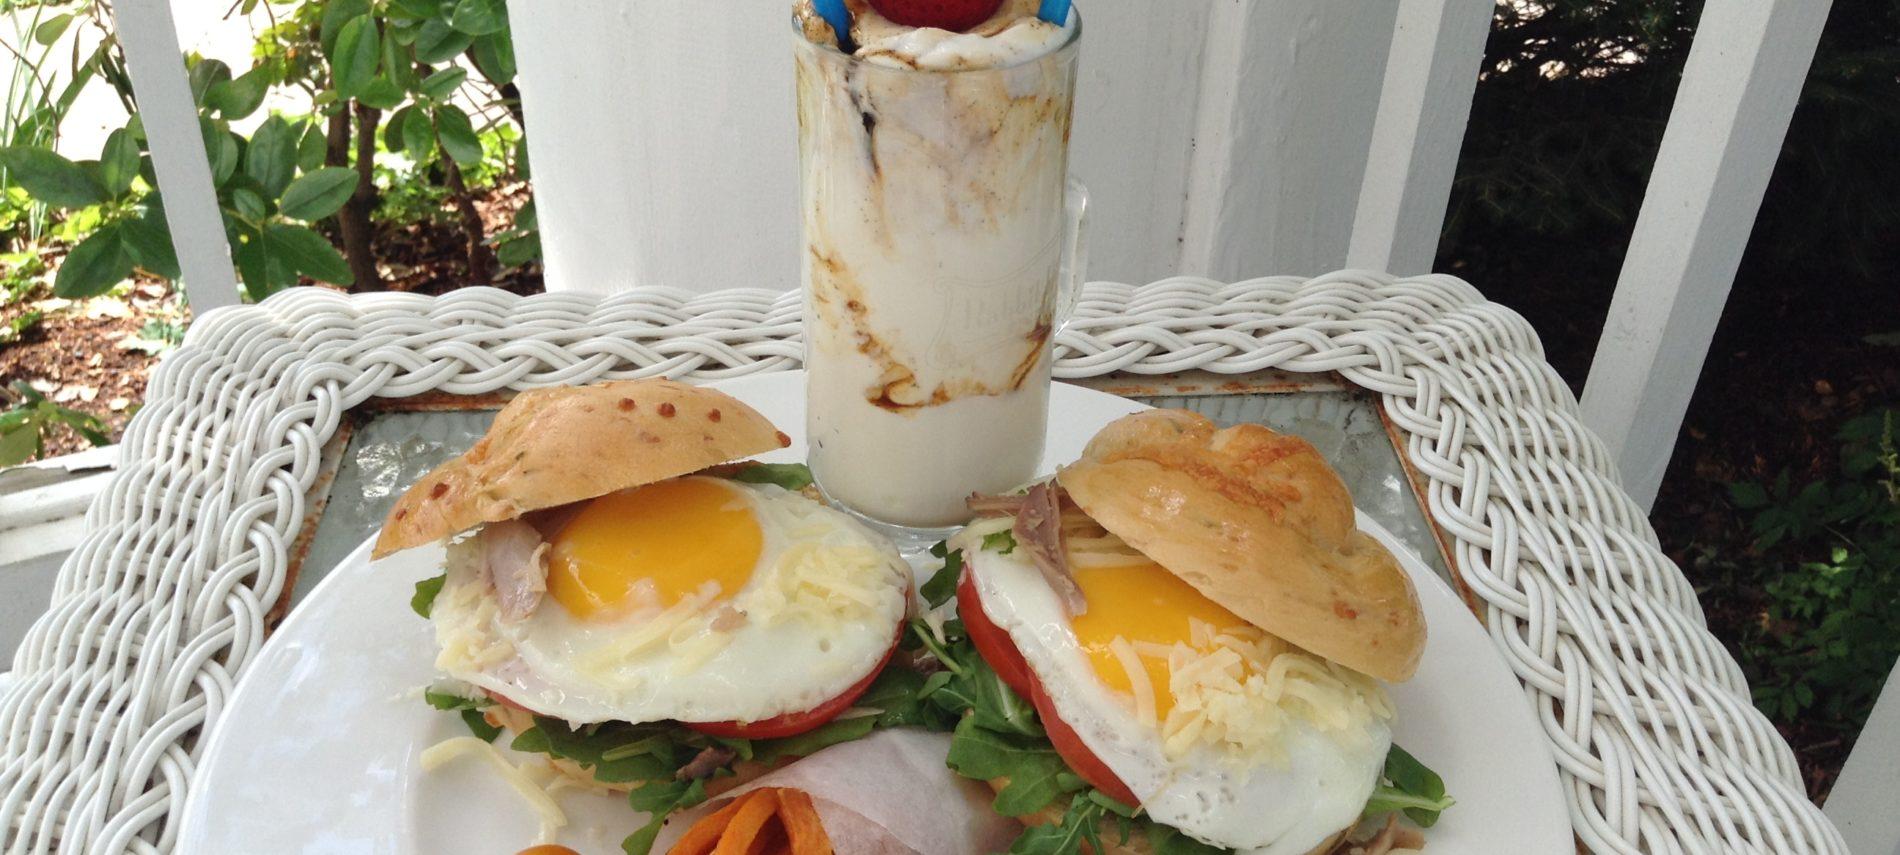 Rabbit Hill Inn's retro breakfast